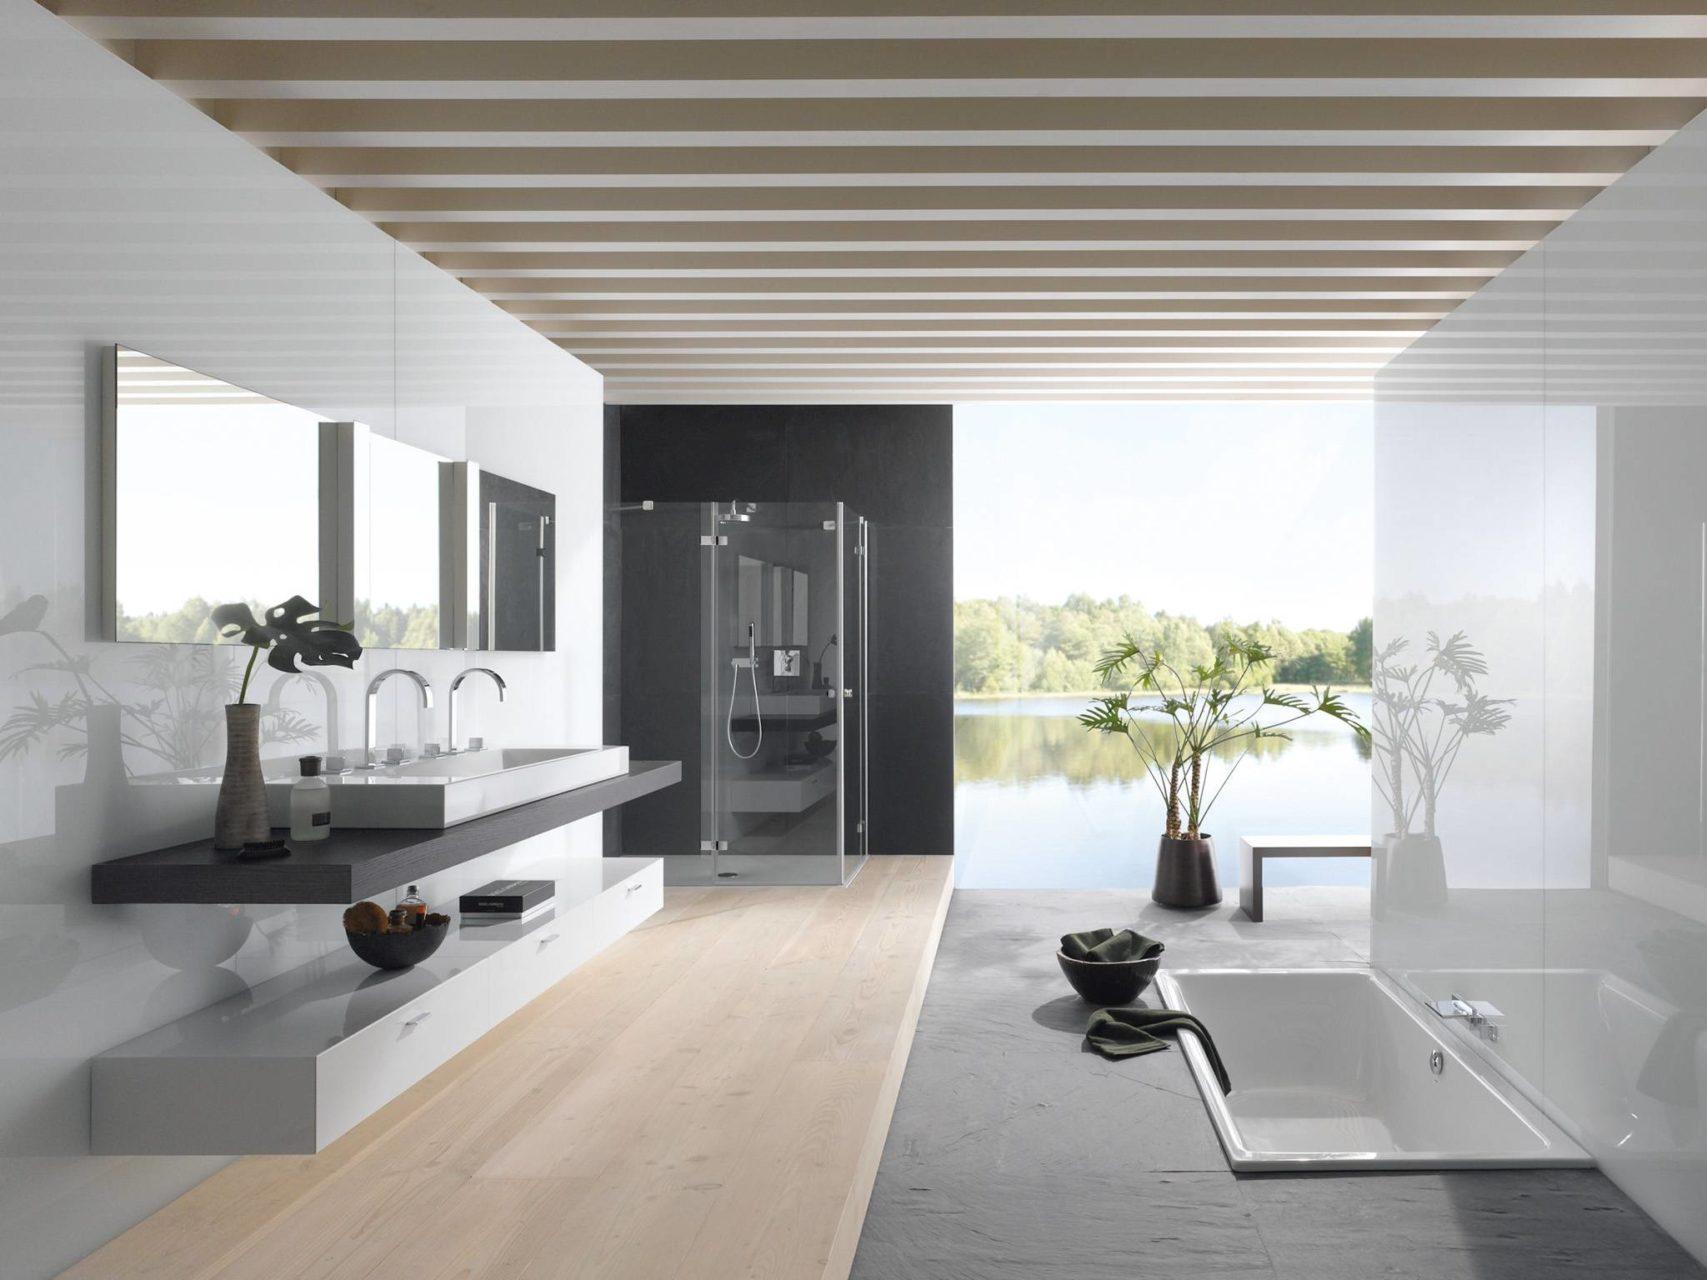 Heizung-Sanitär-Installateur-Badezimmer